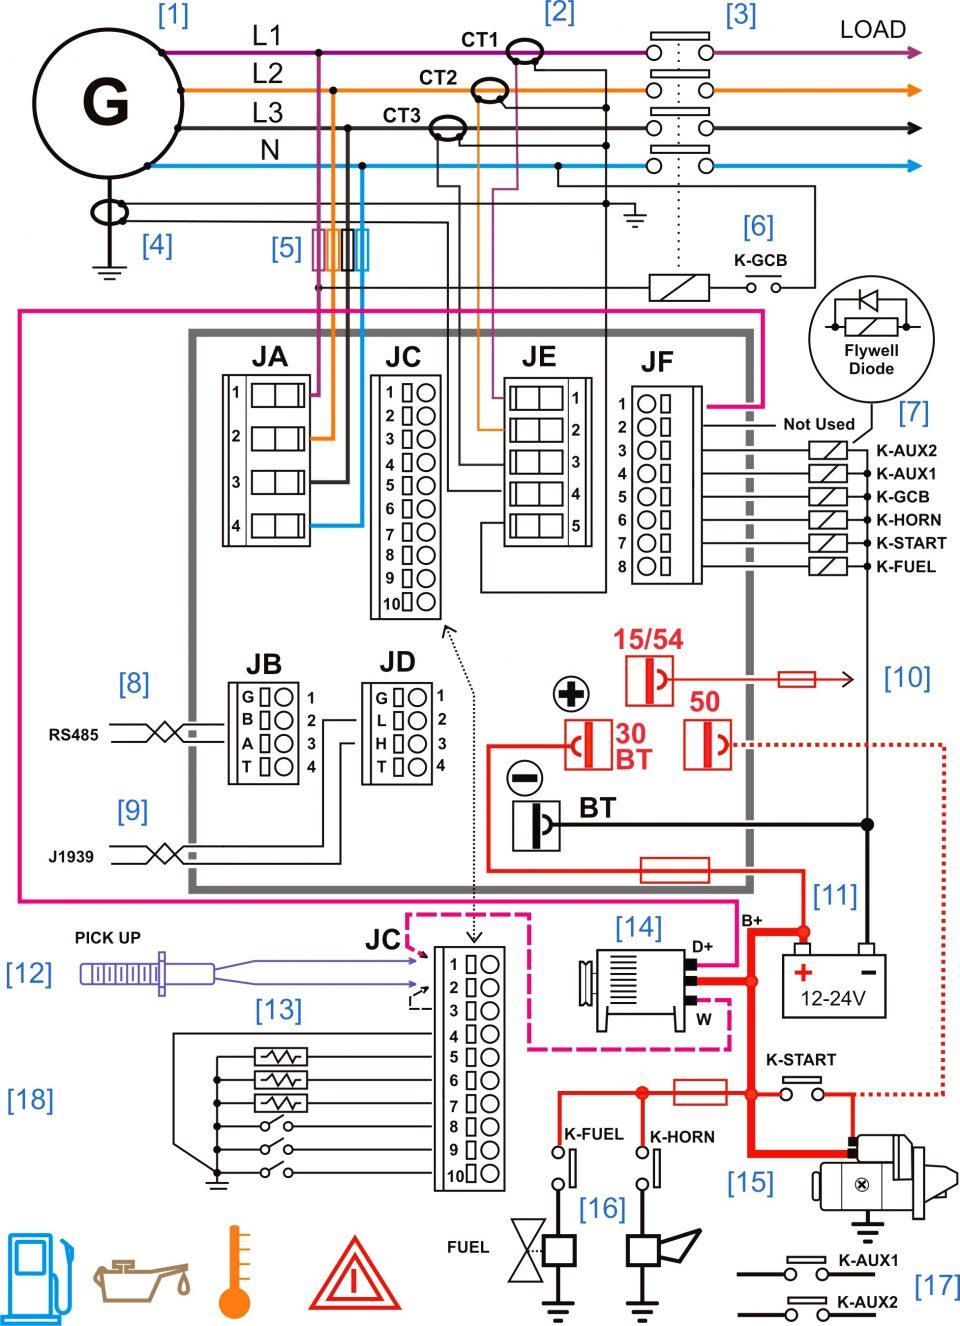 Admirable Adt Alarm Wiring Diagram Download Wiring Cloud Rometaidewilluminateatxorg